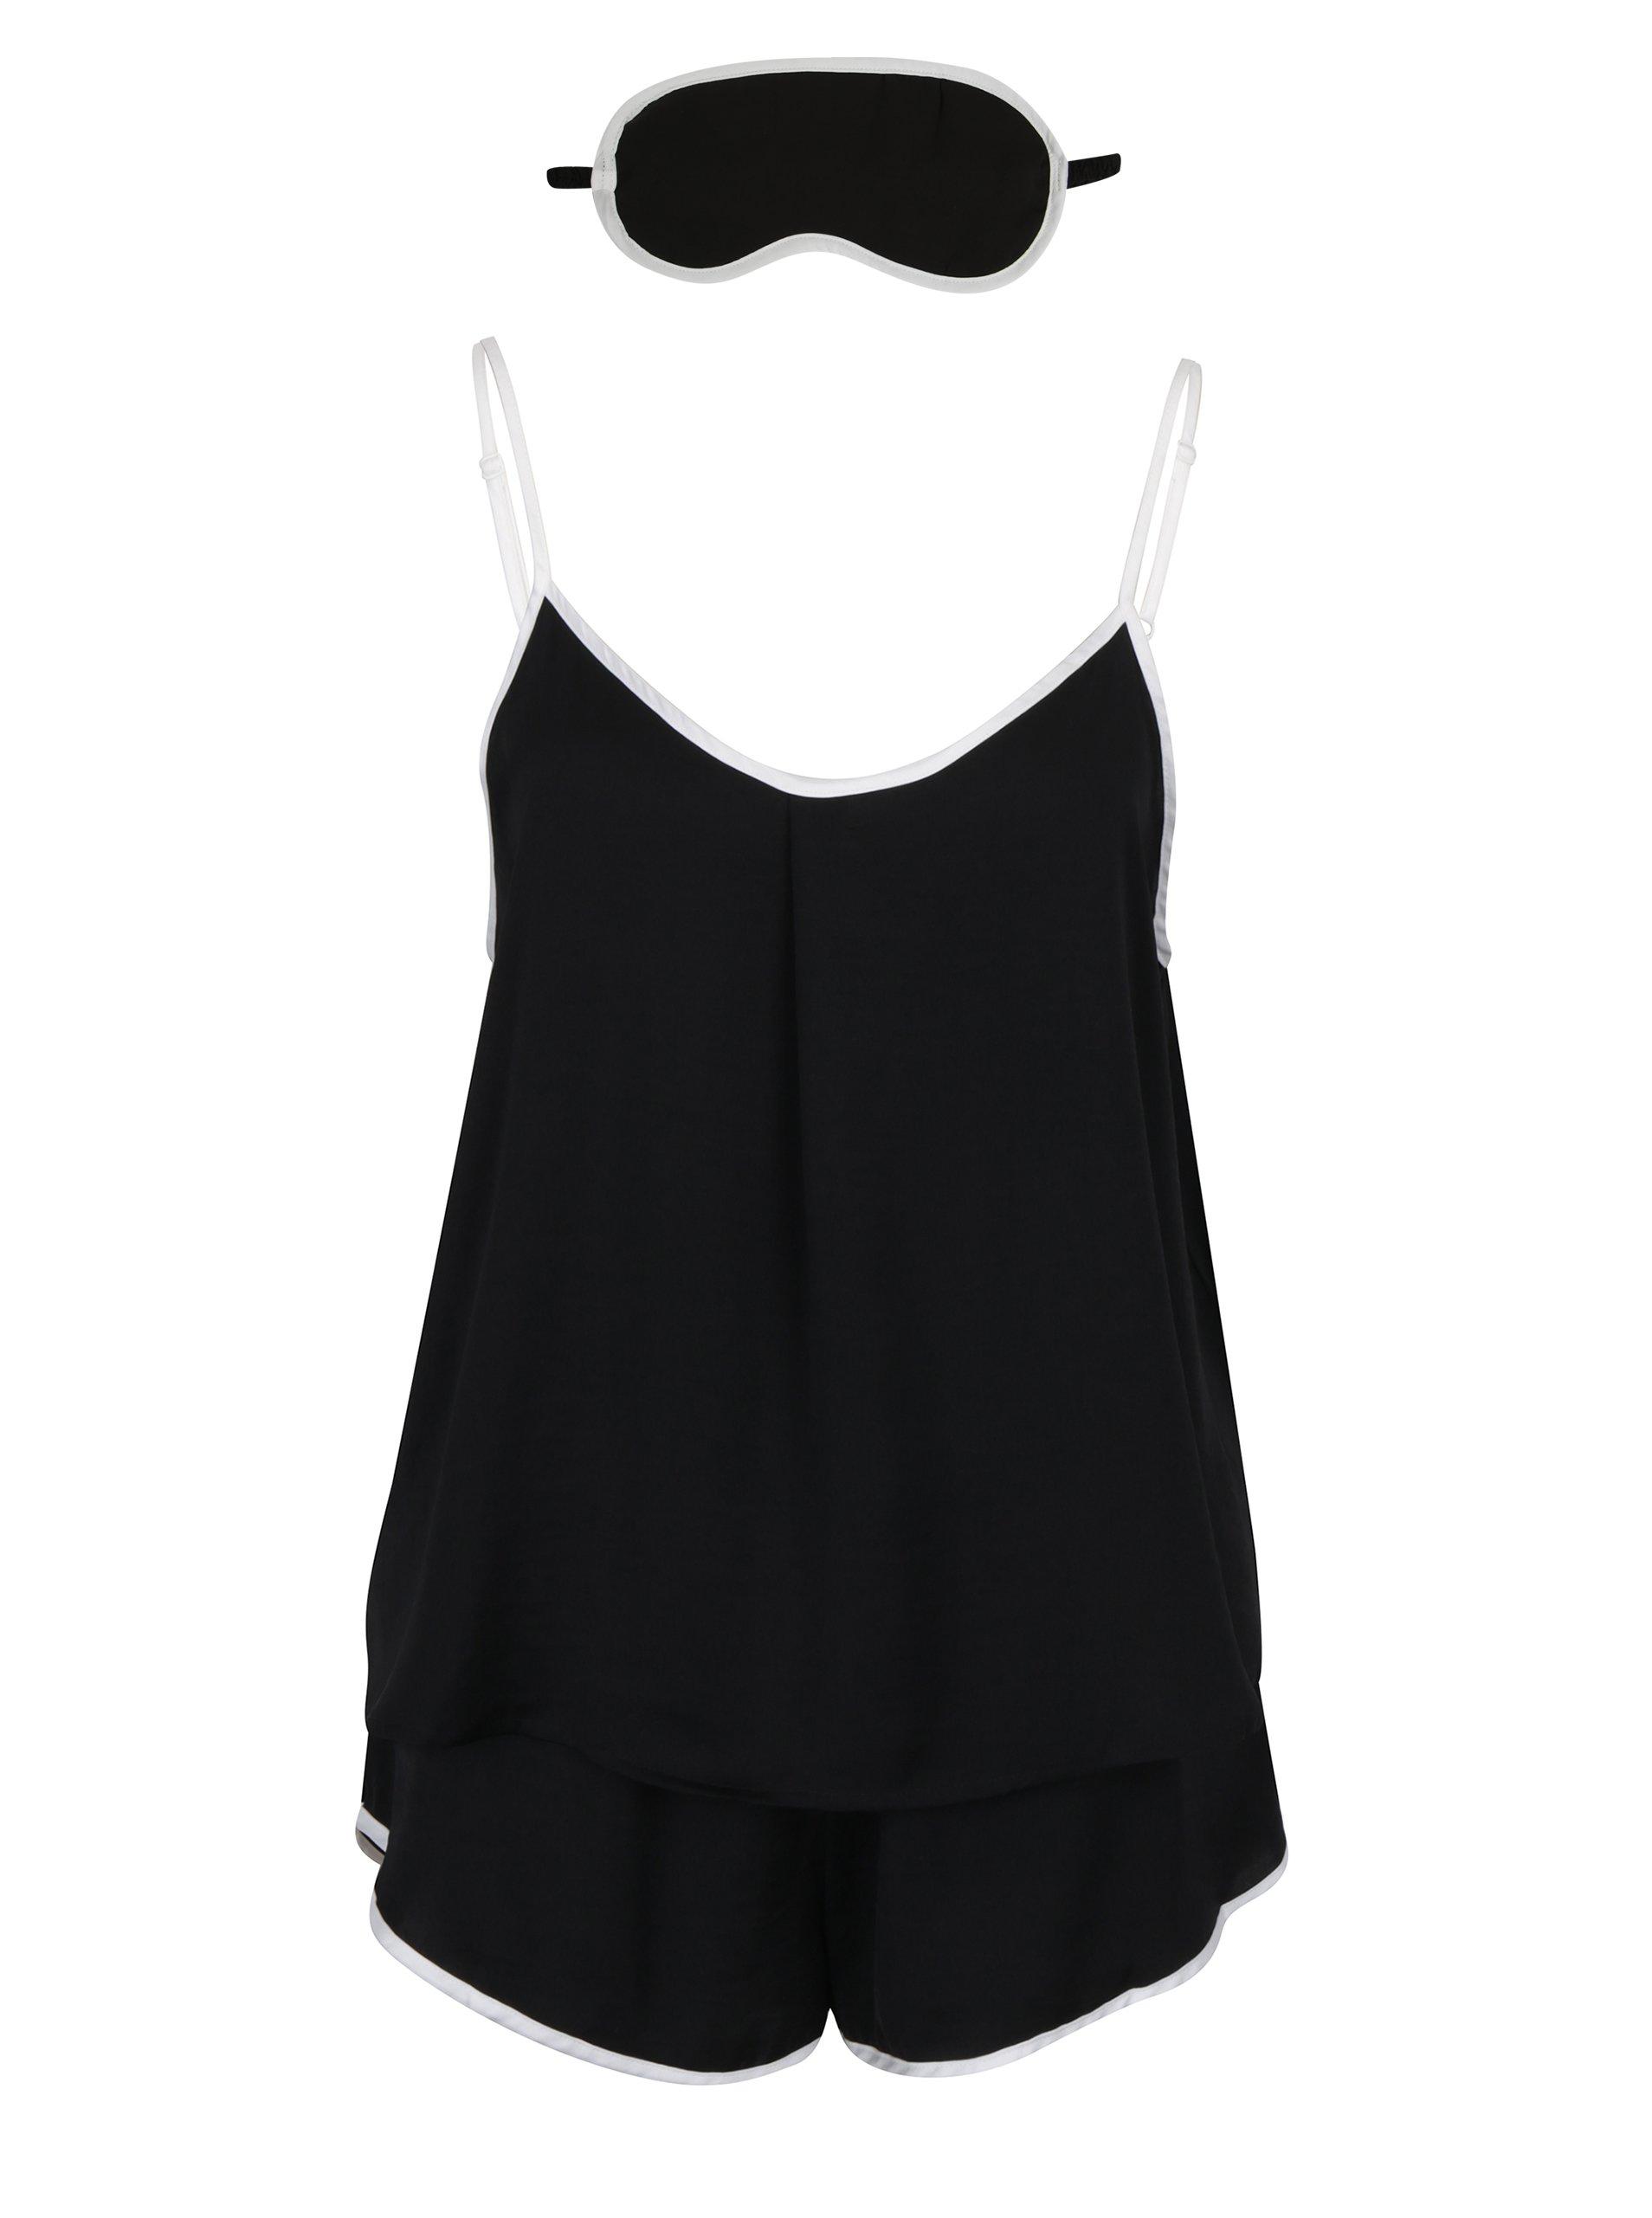 Černý set pyžama s bílým lemem a masky na spaní DKNY